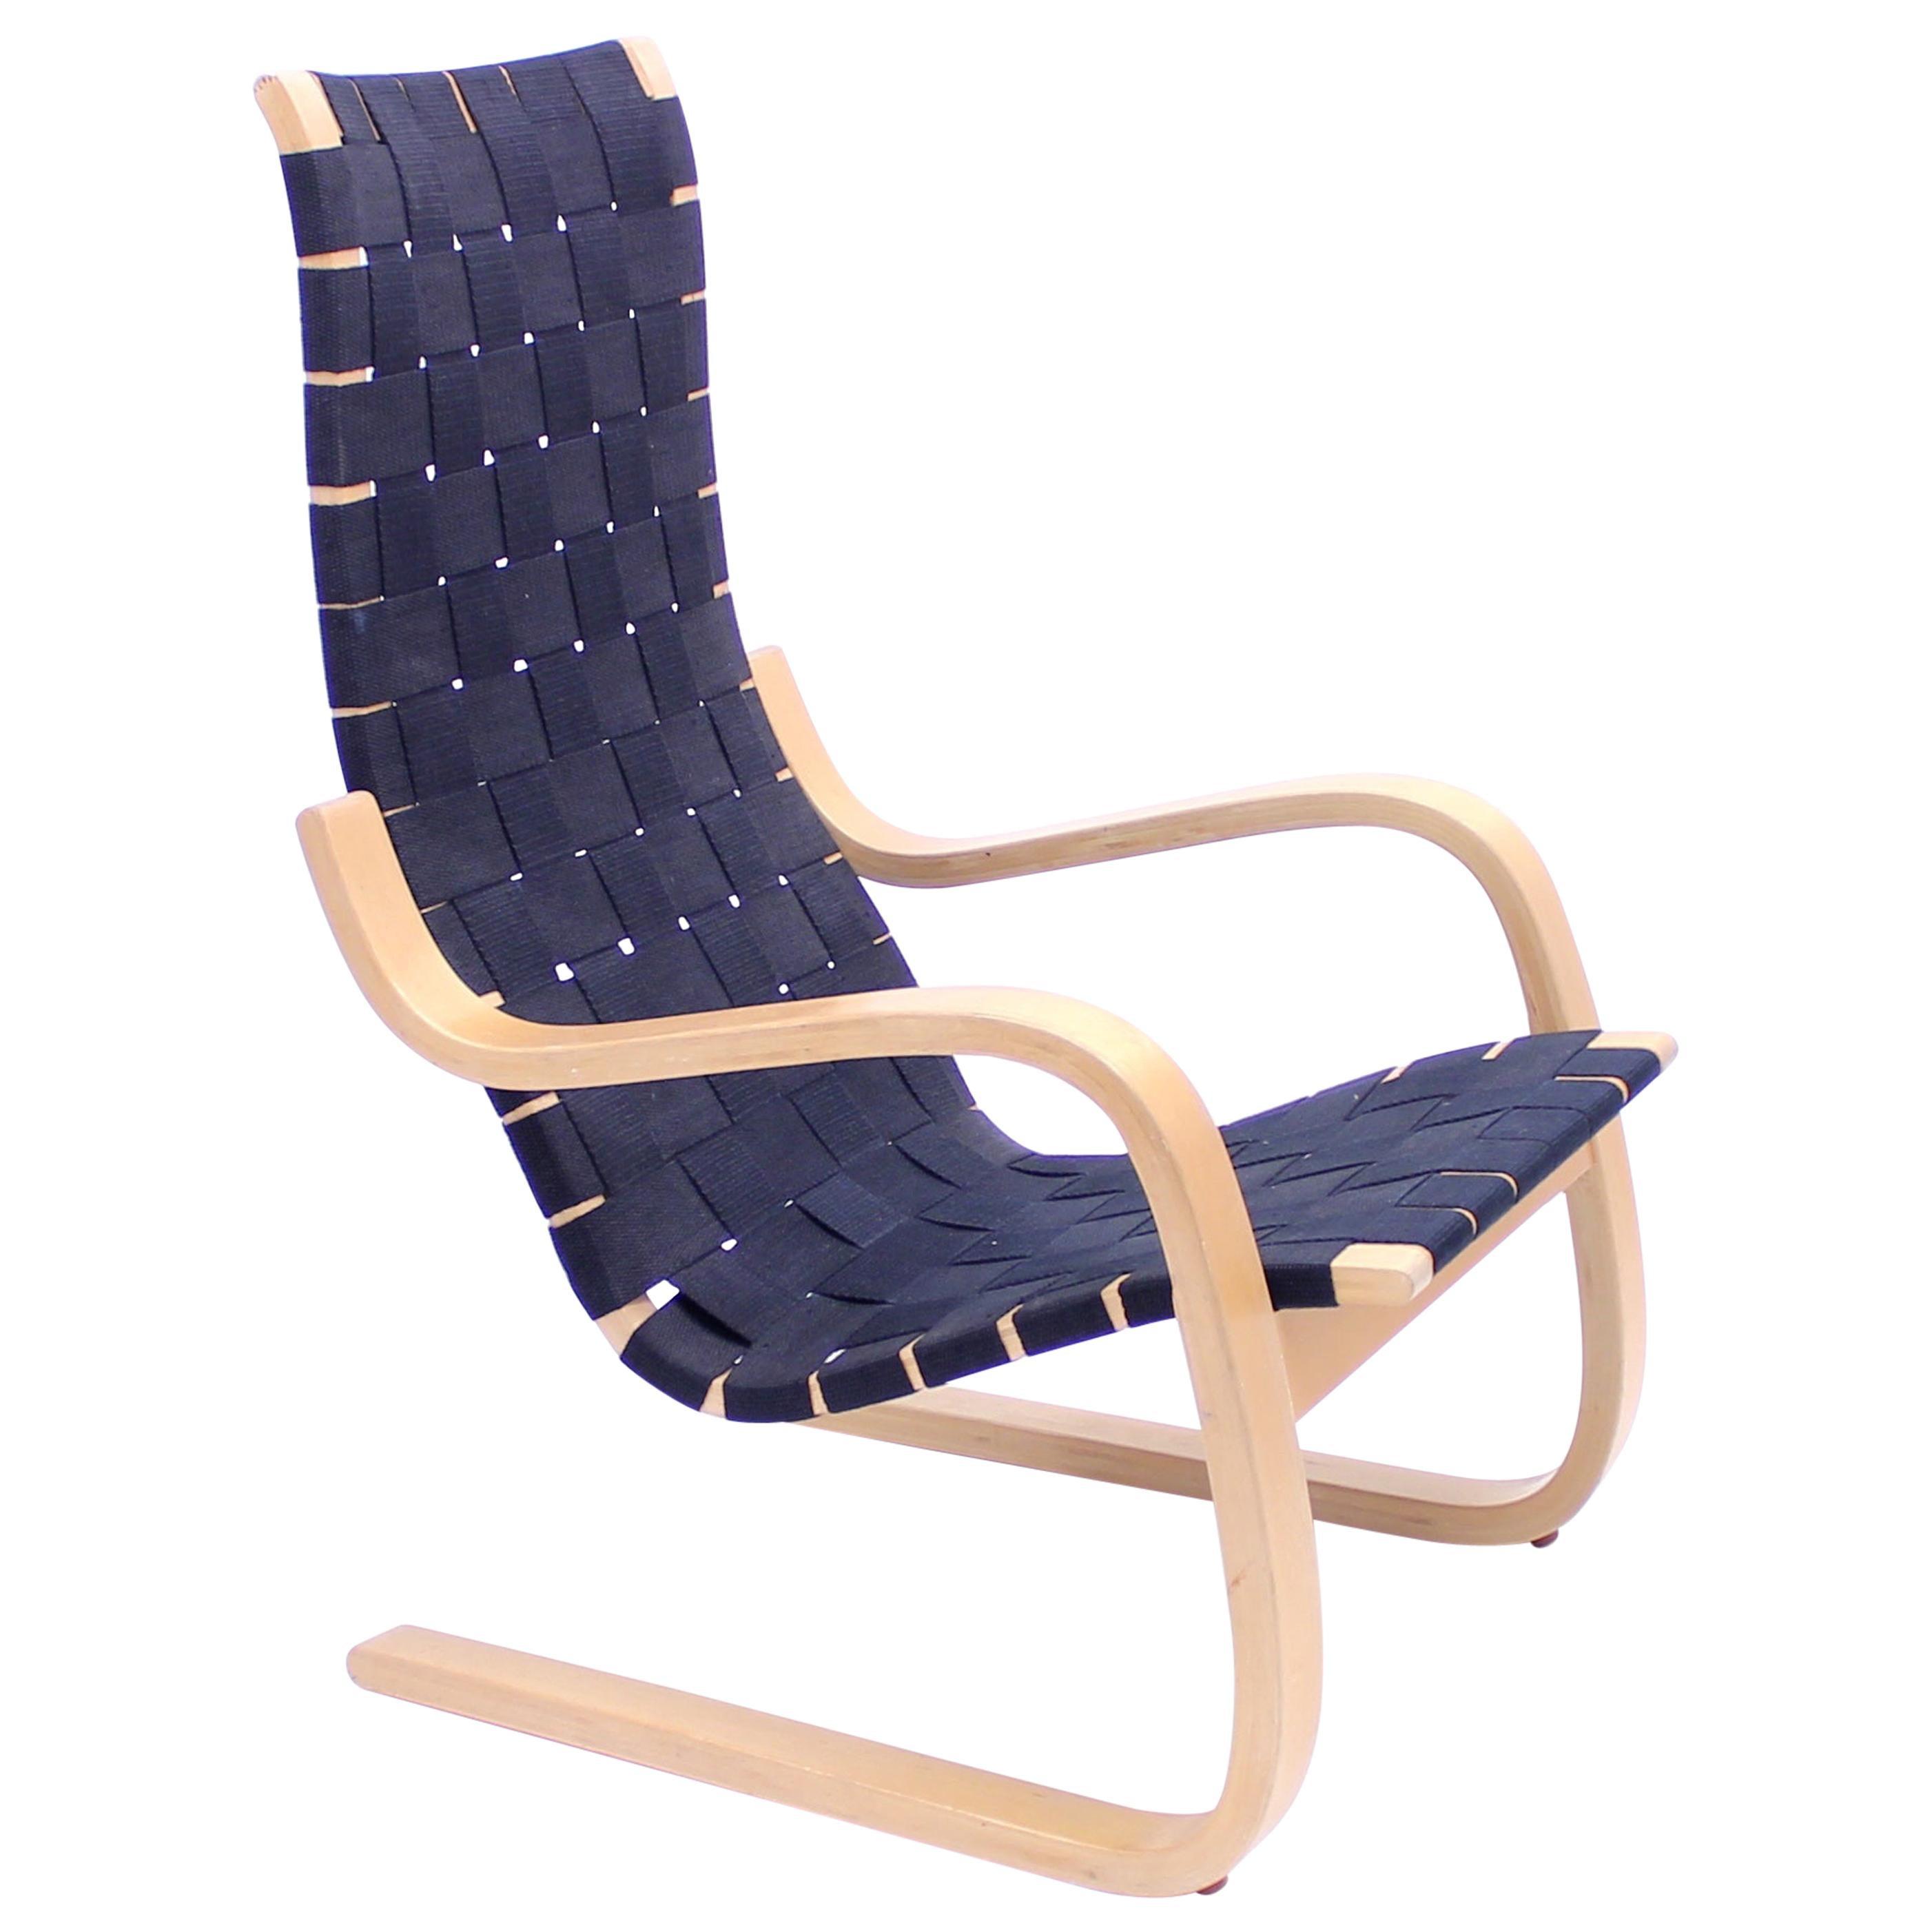 Alvar Aalto, Early Lounge Chair Model 406, Artek, Hedemora